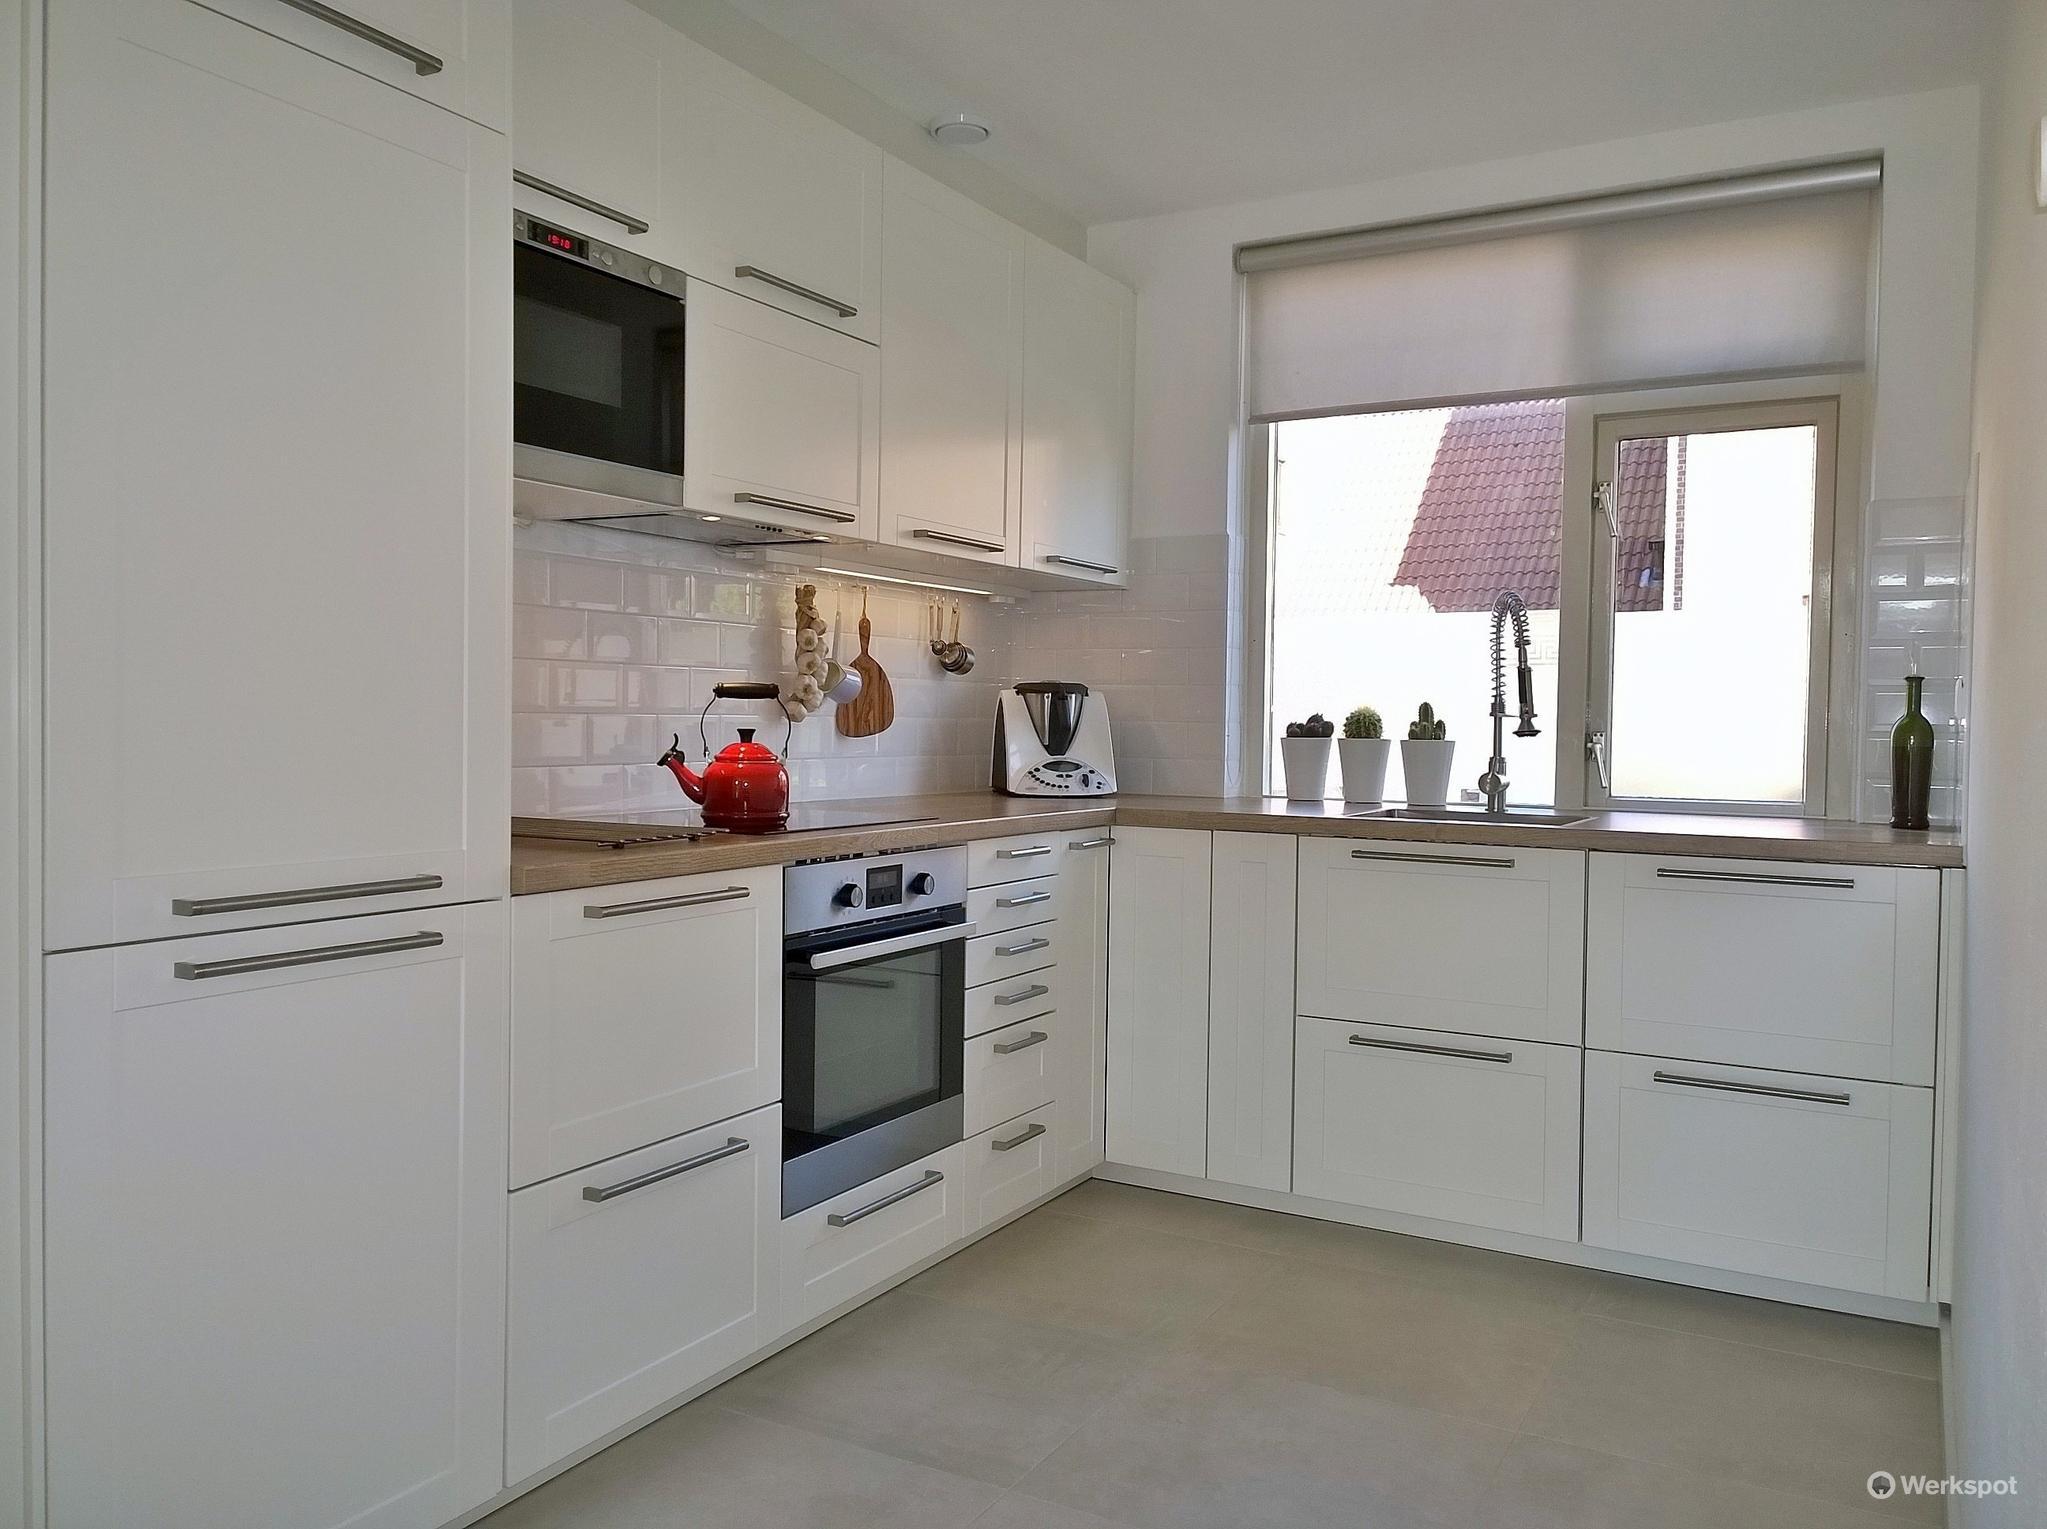 Ikea Ekestad Keuken : Keuken renoveren ikea houten keukenfronten maatwerk lades en